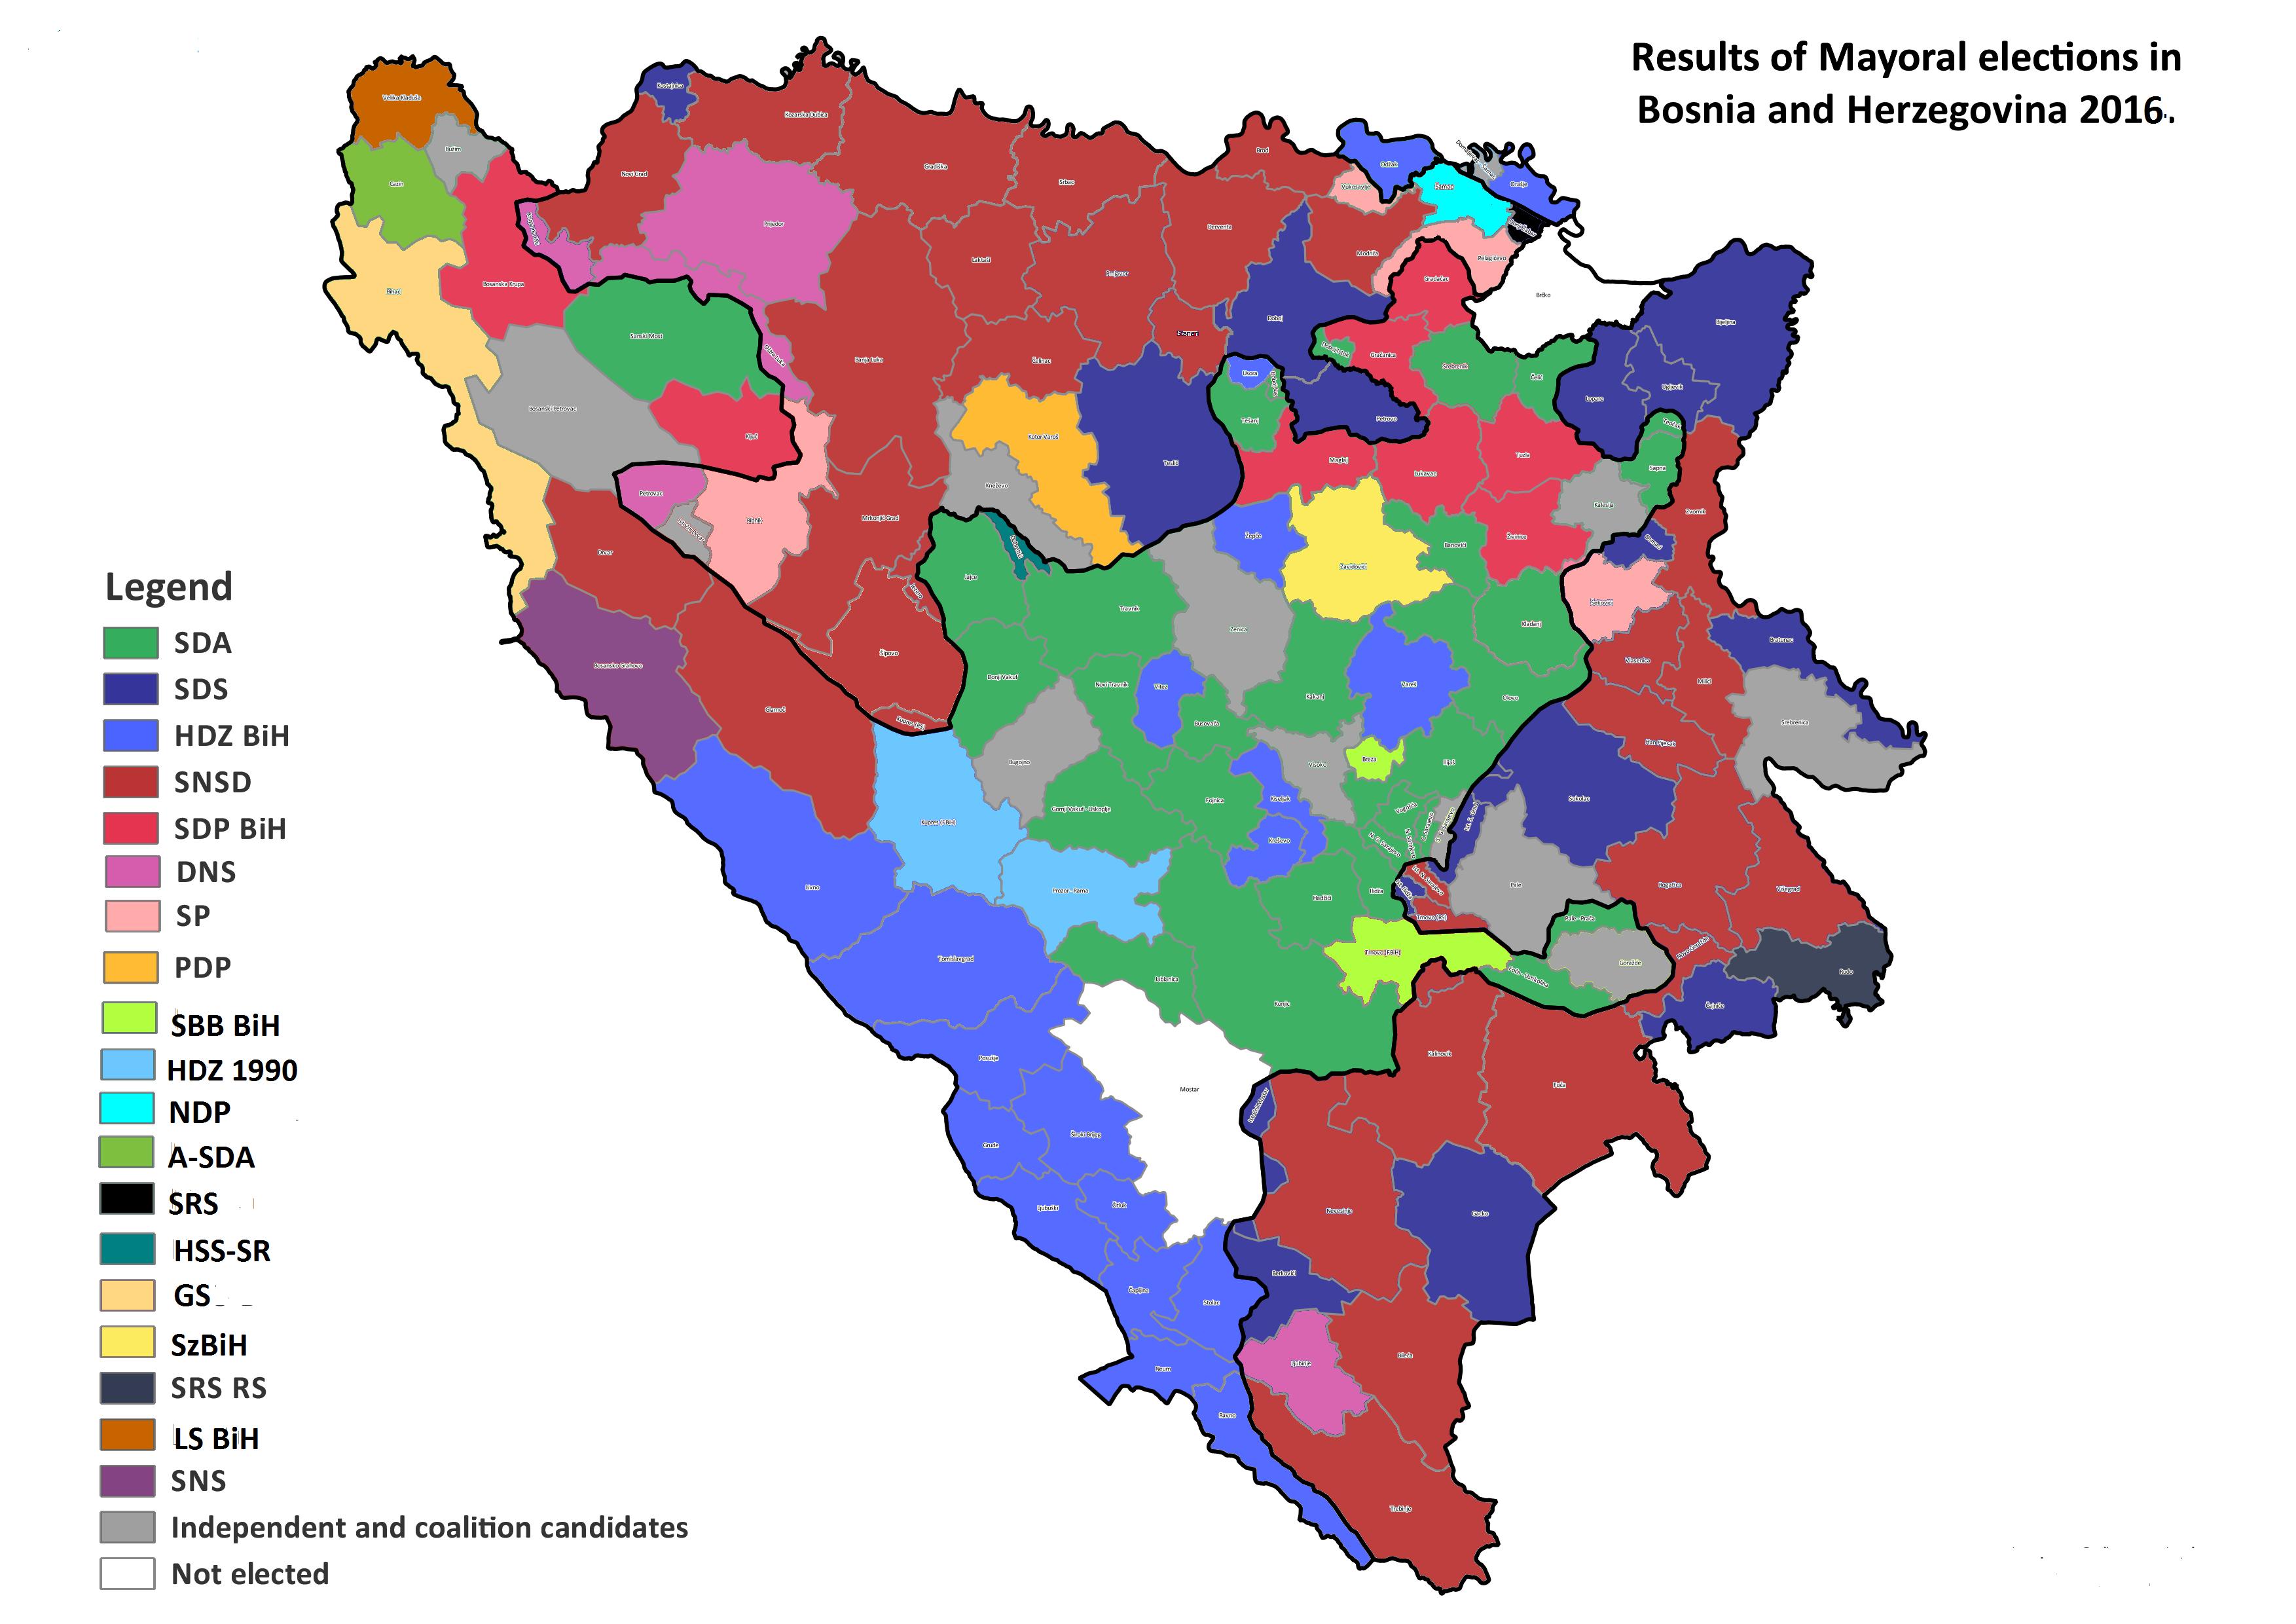 Dodik protiv odlaska Miloševića u Knin Bosnia_and_Herzegovina%2C_mayoral_elections%2C_2016